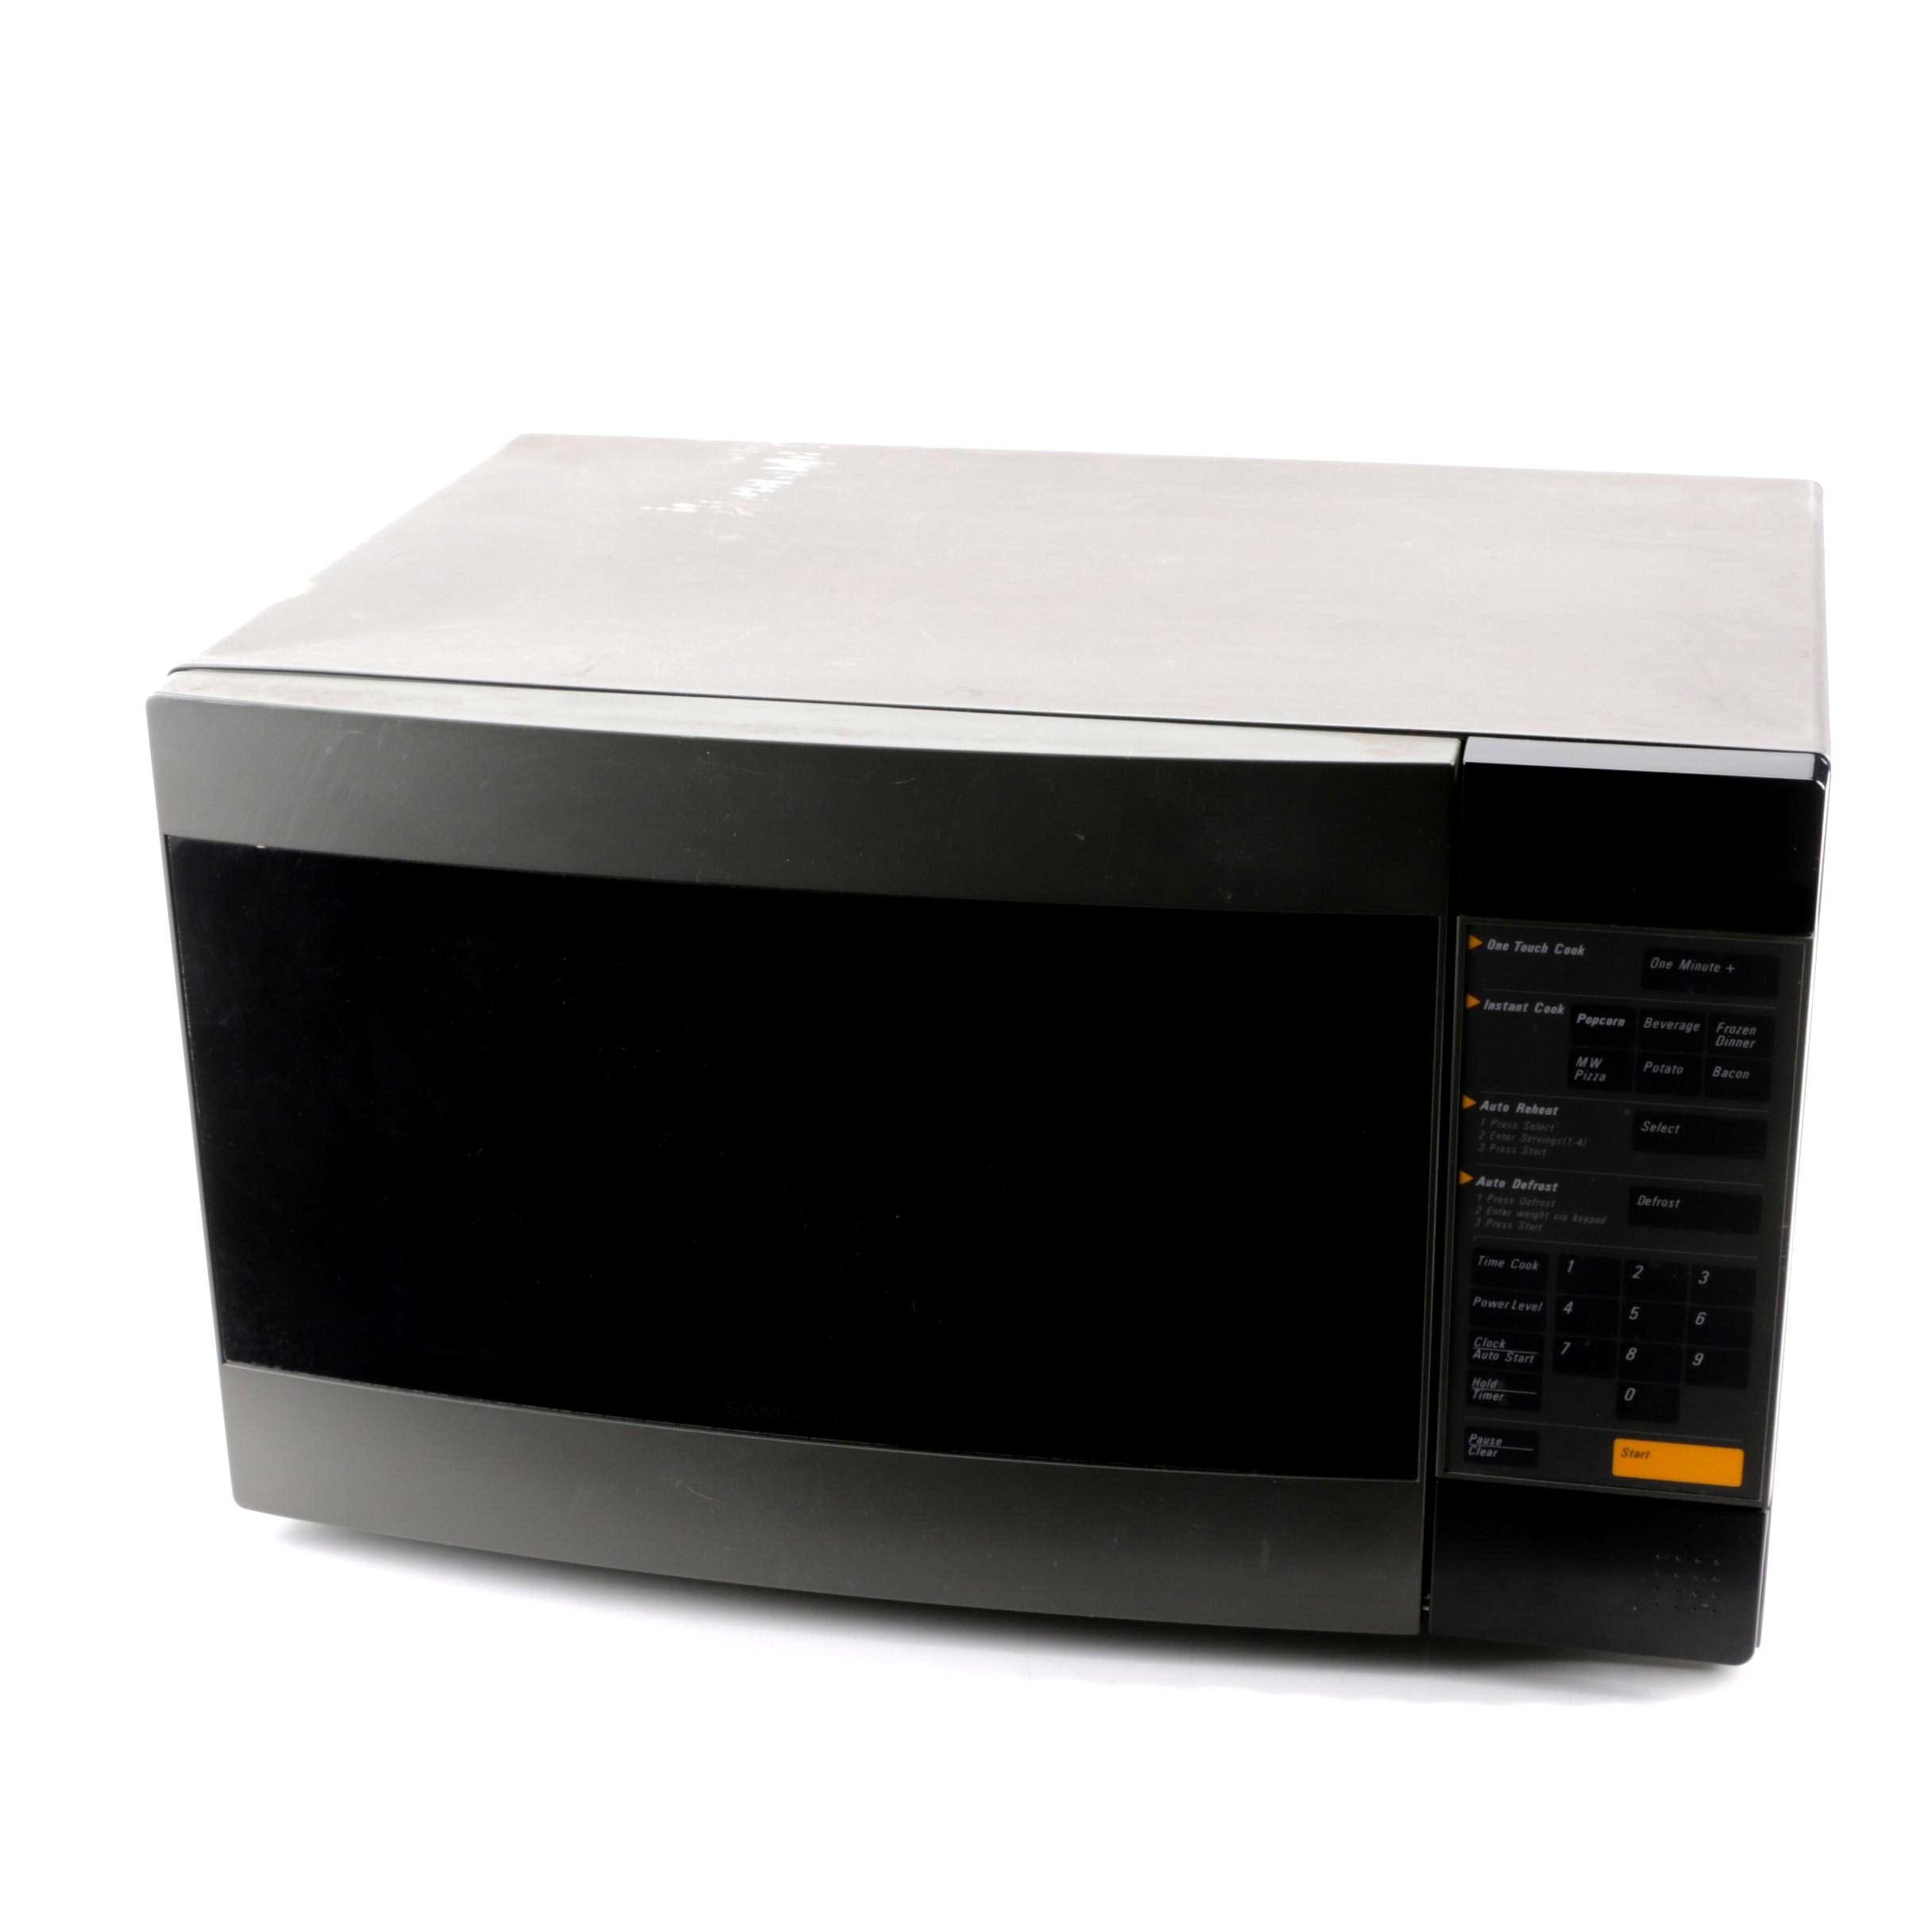 Samsung Countertop Microwave